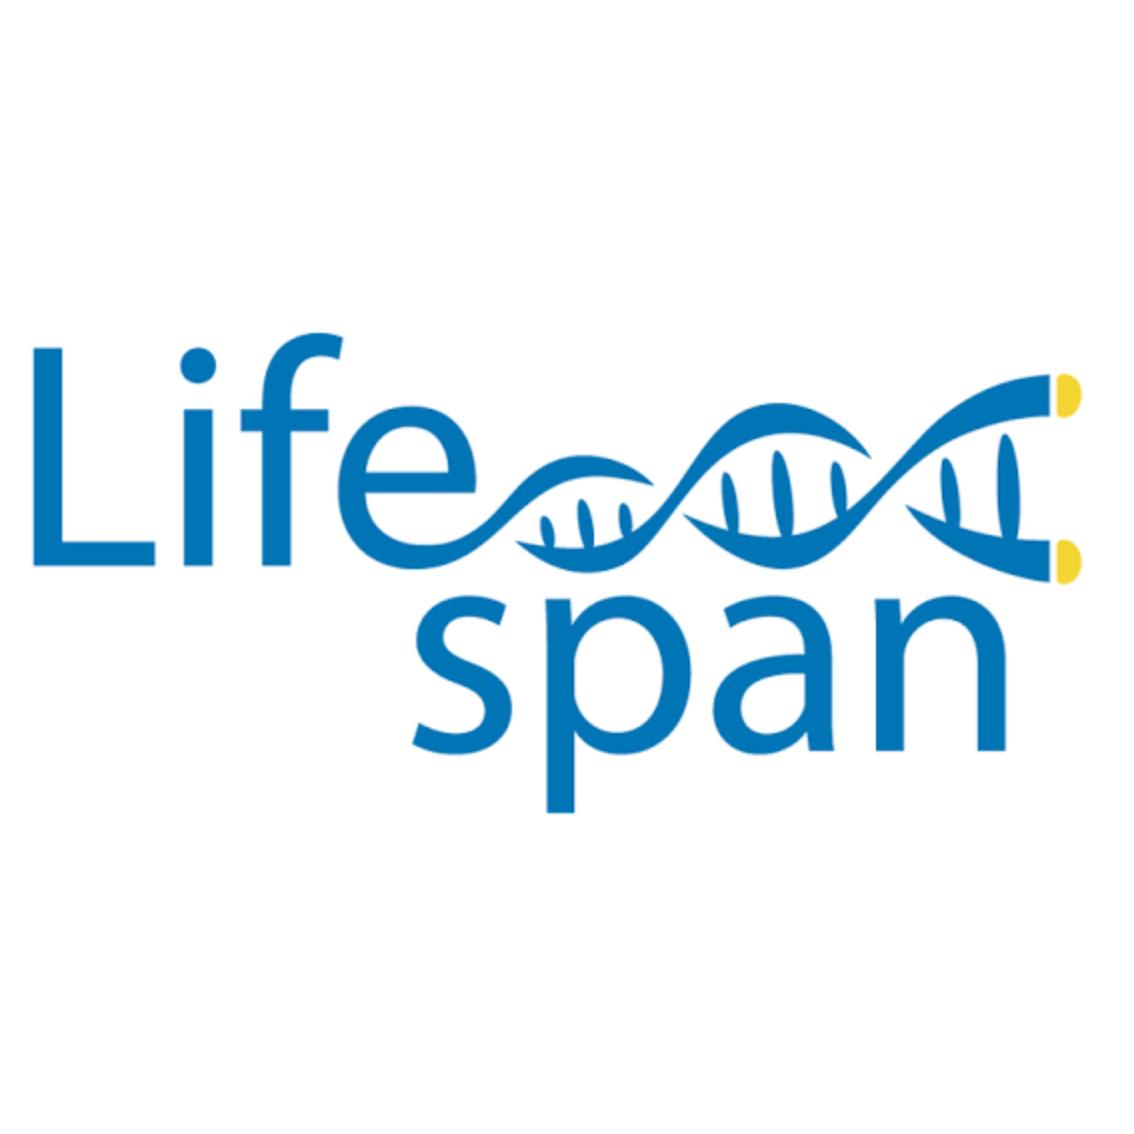 Lifespan: The Center for Anti-Aging & Regenerative Medicine